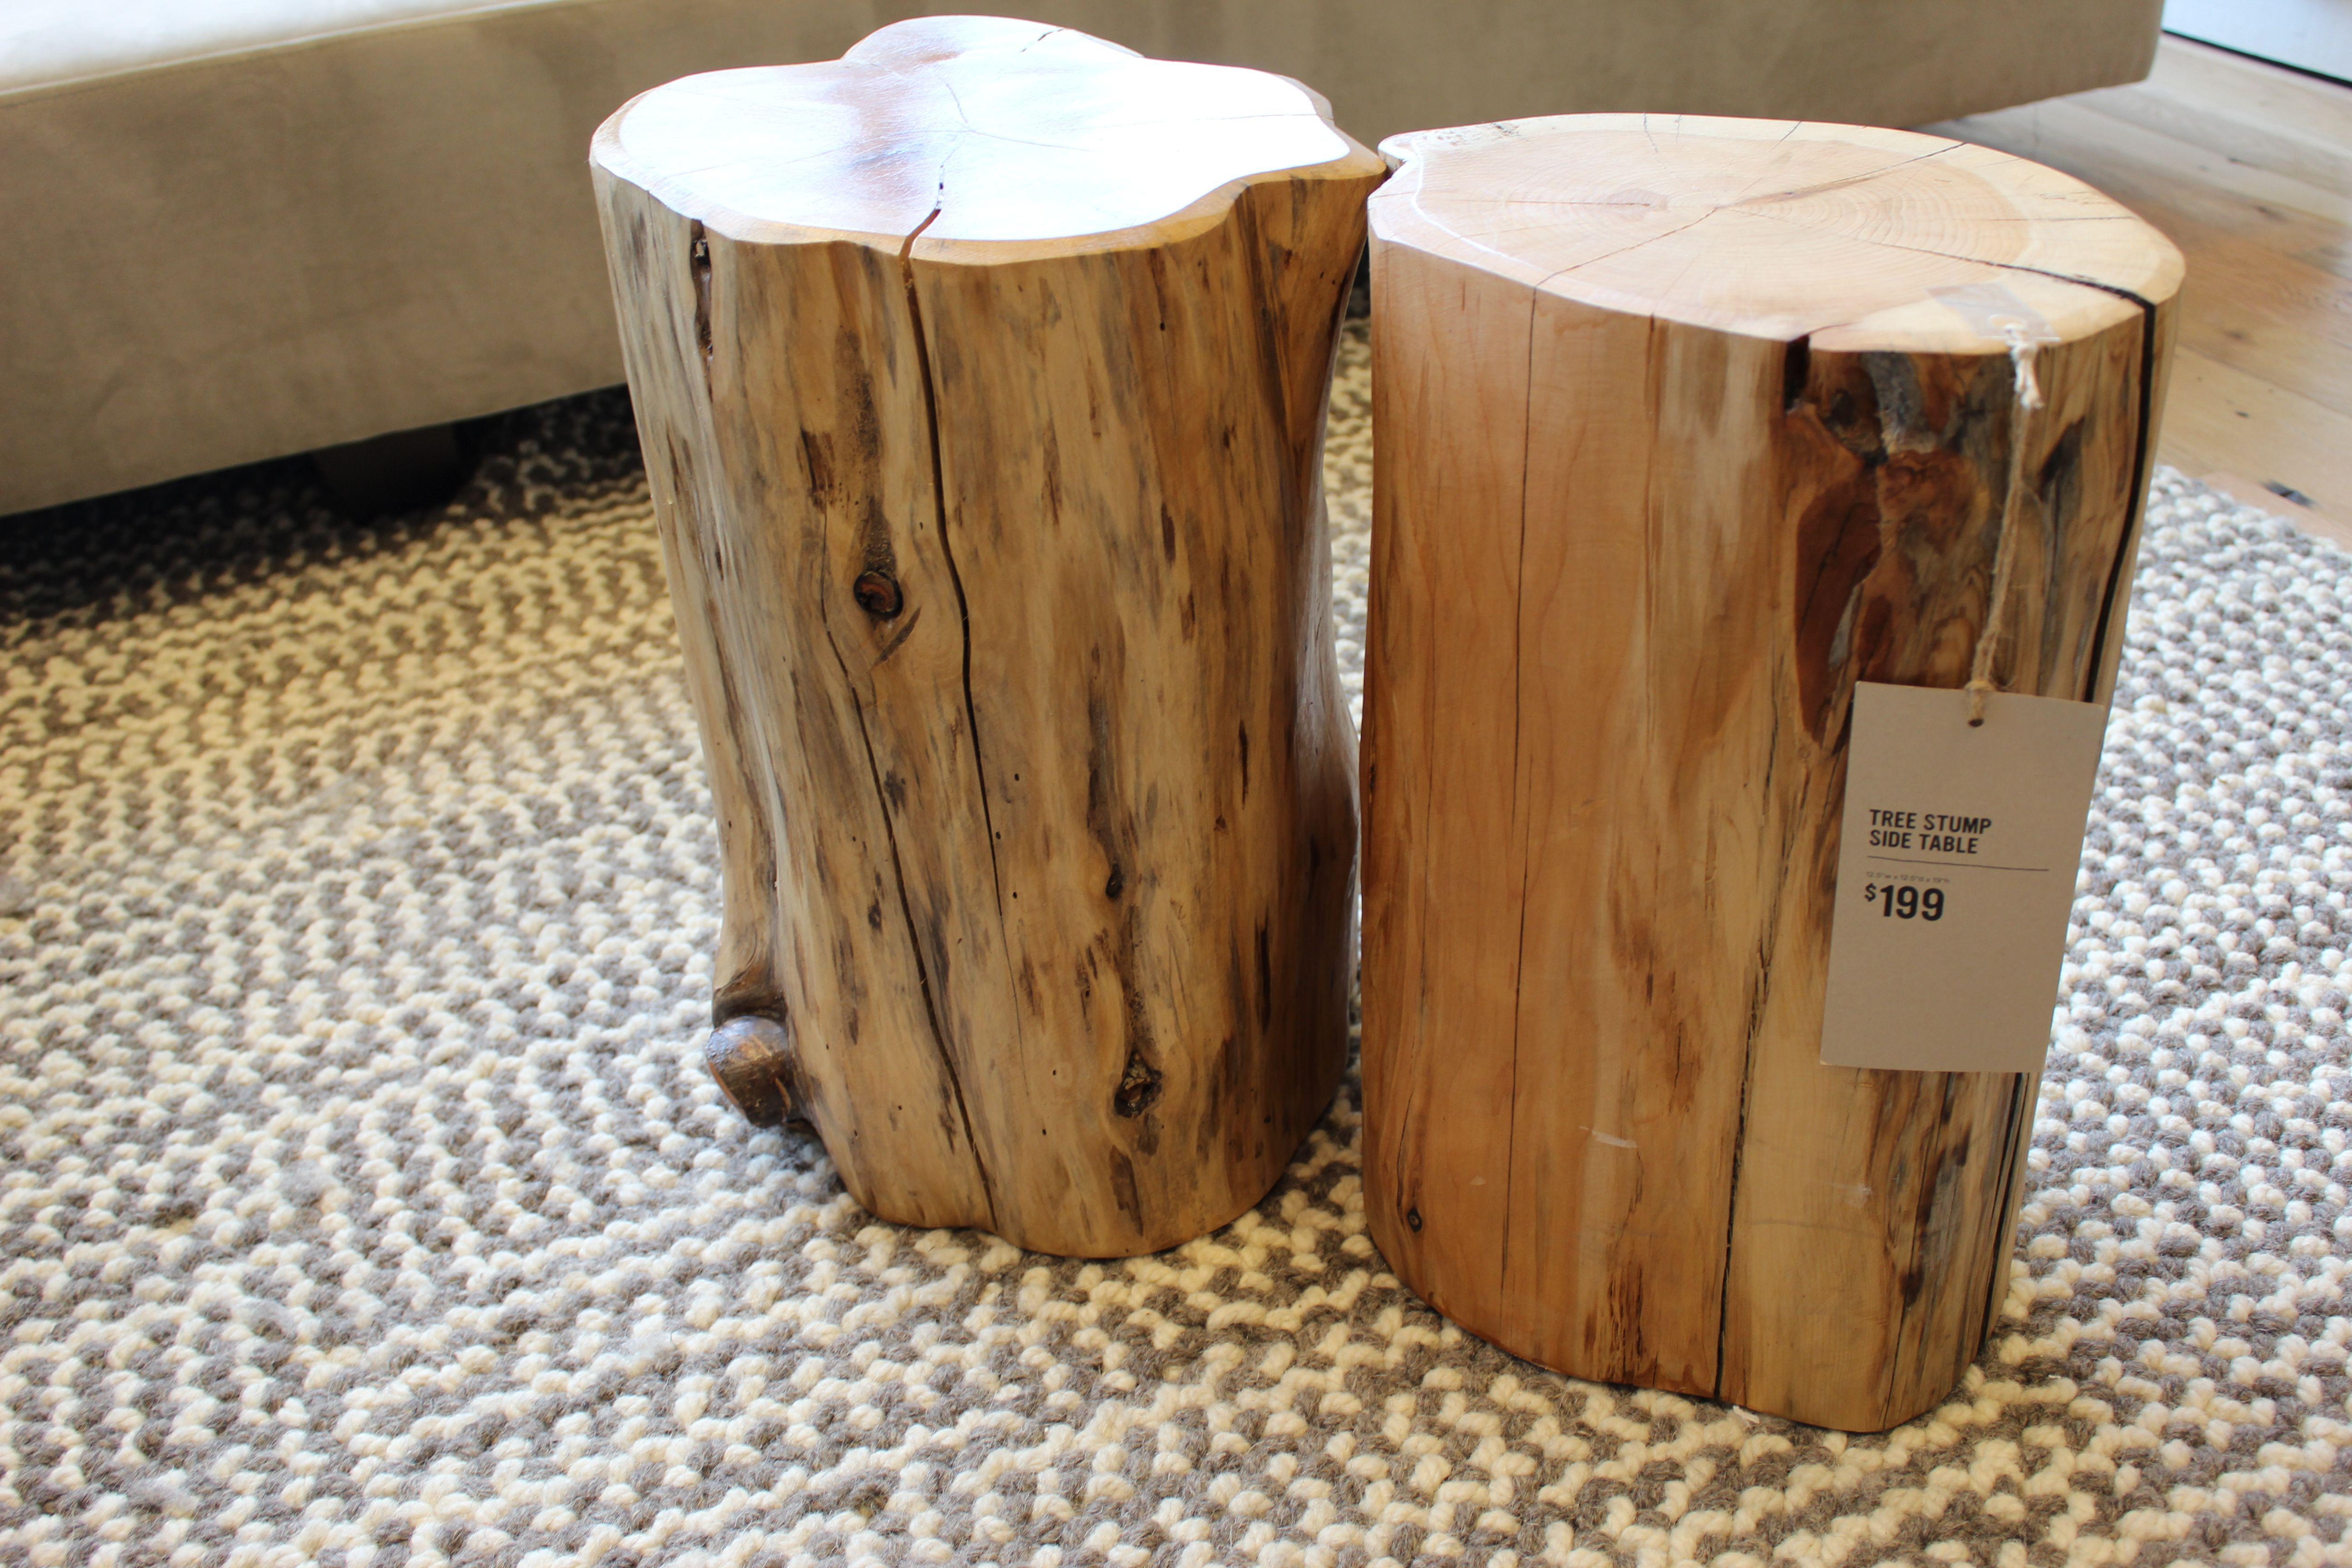 Tree Stump Table Singapore 6600 Coffee Table Wood Trunk Side